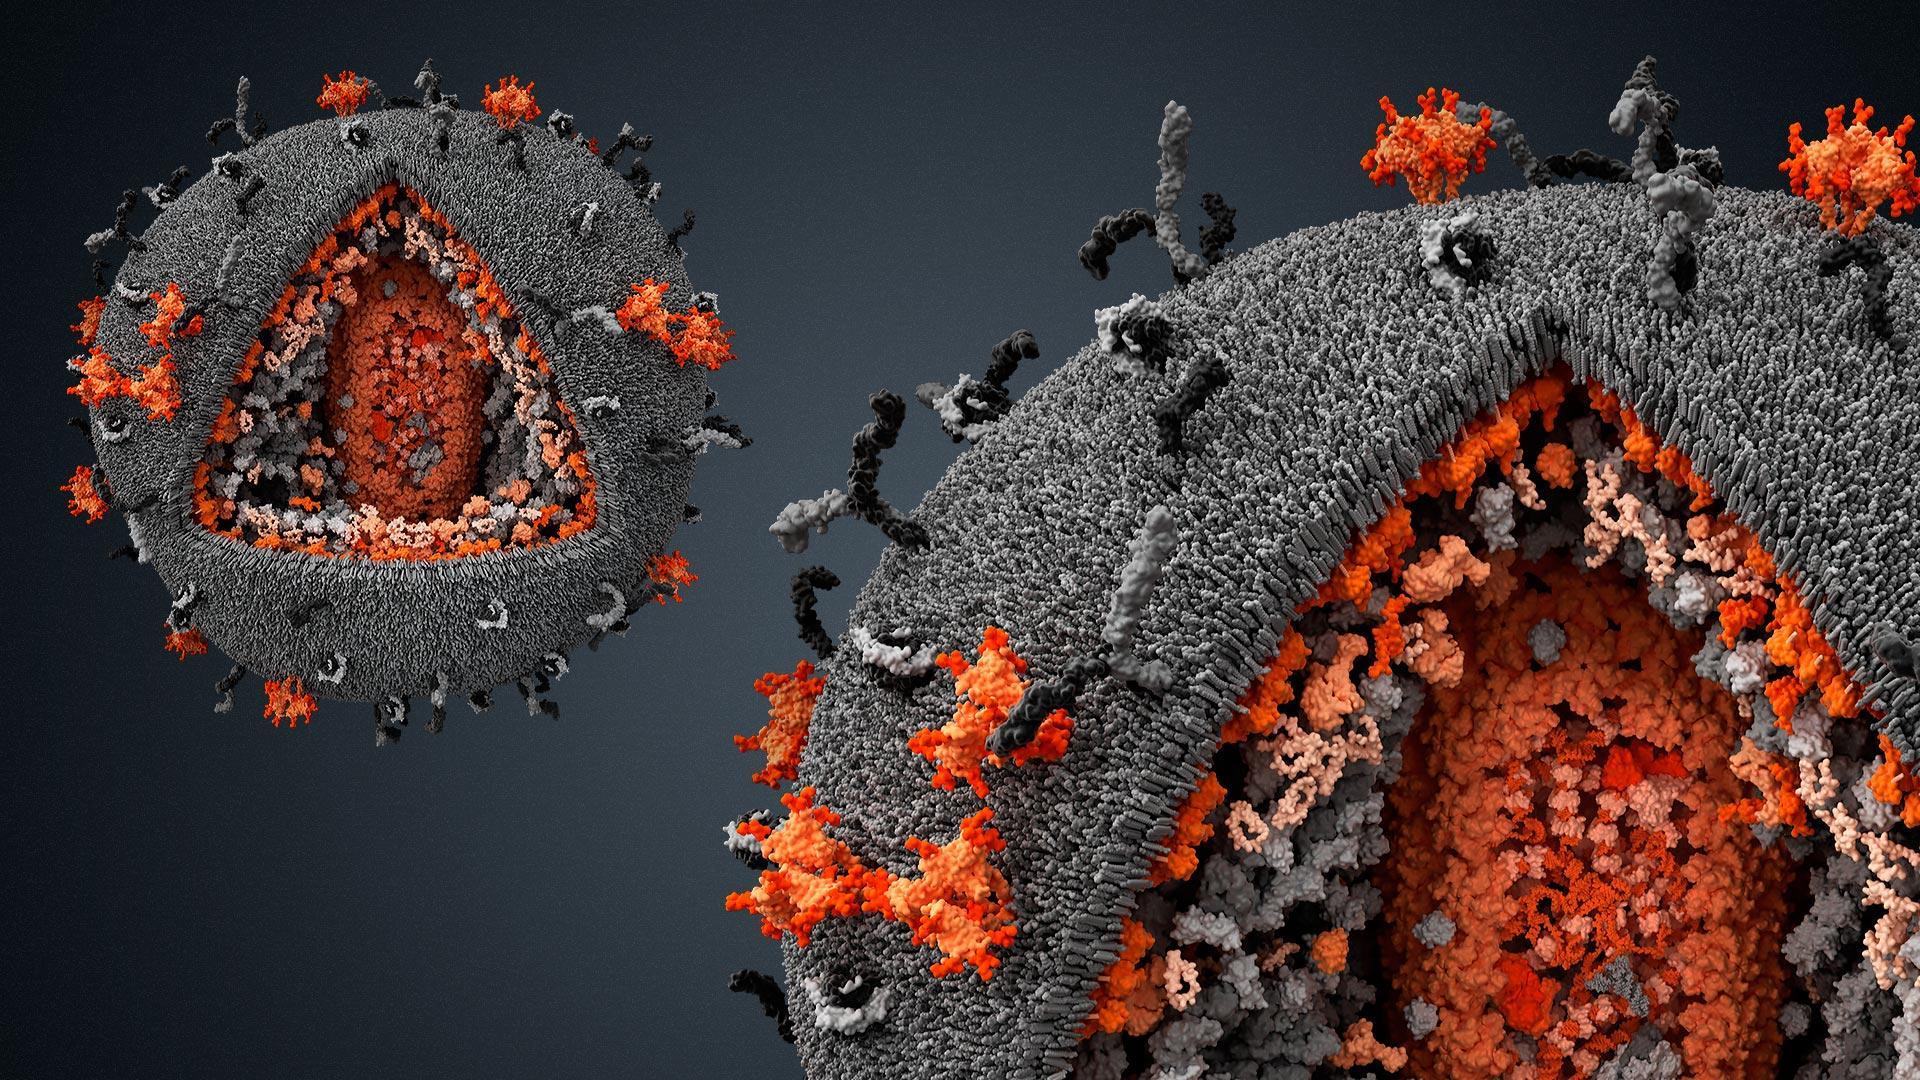 ВИЧ-мифология и ее разоблачение